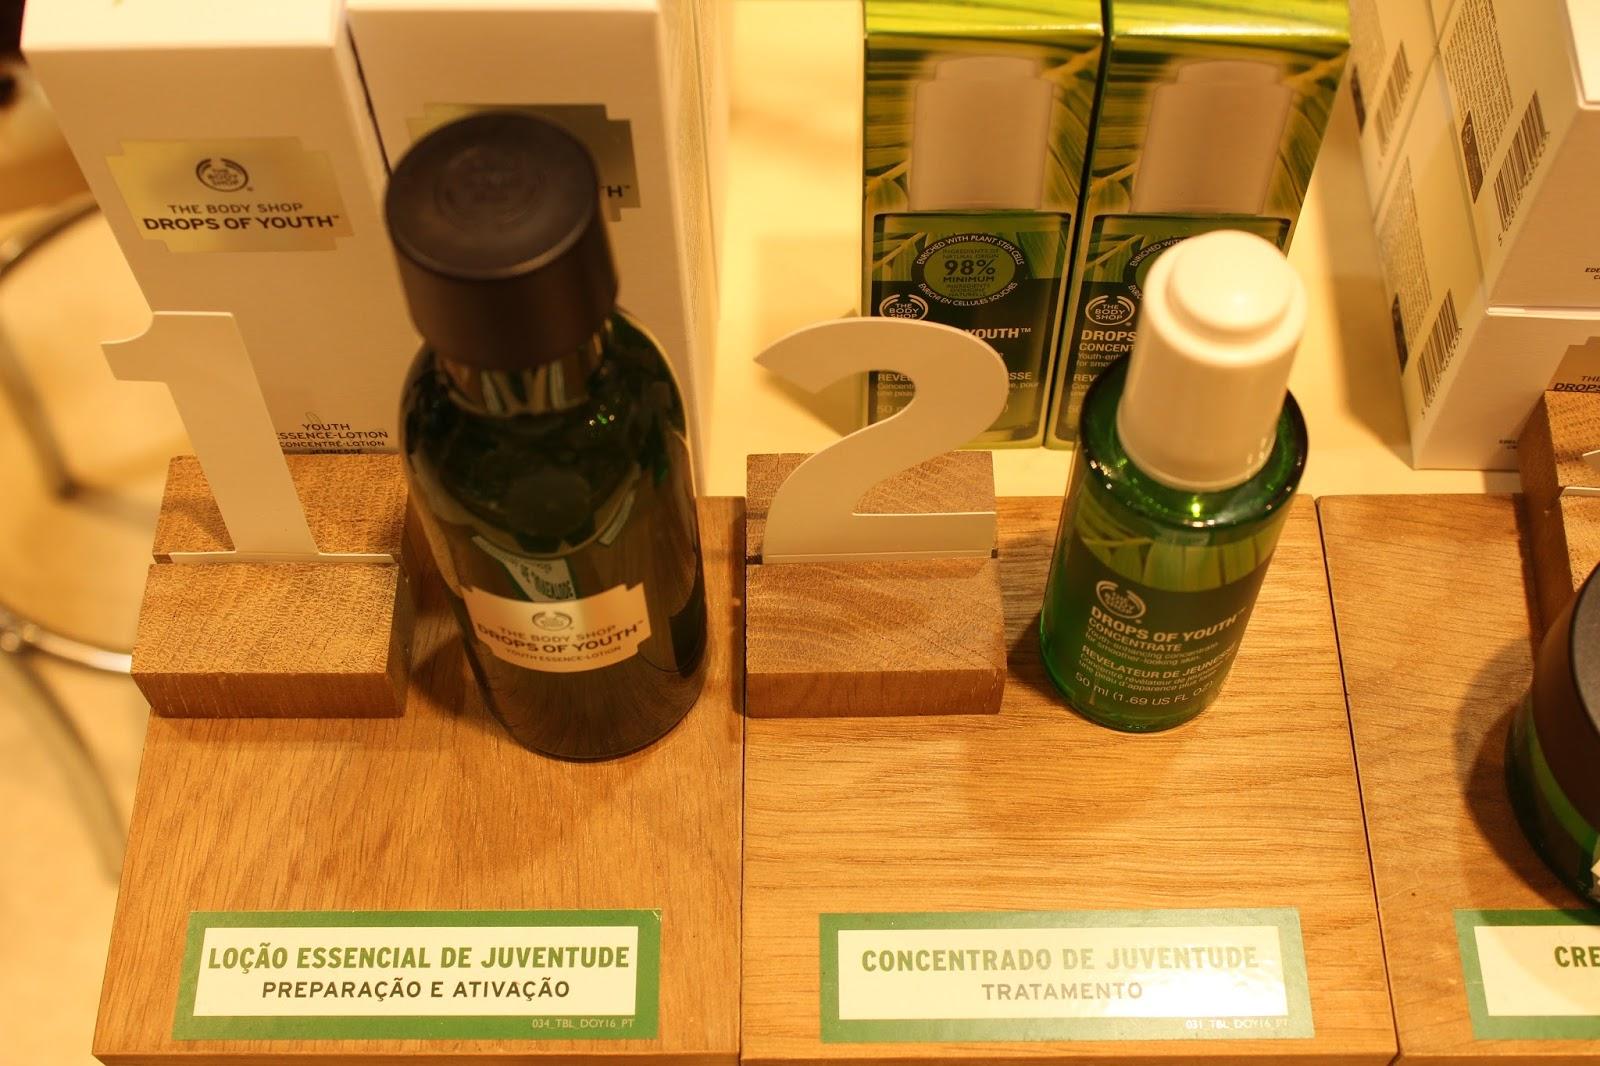 Enfrente pacotes contra a dermatite